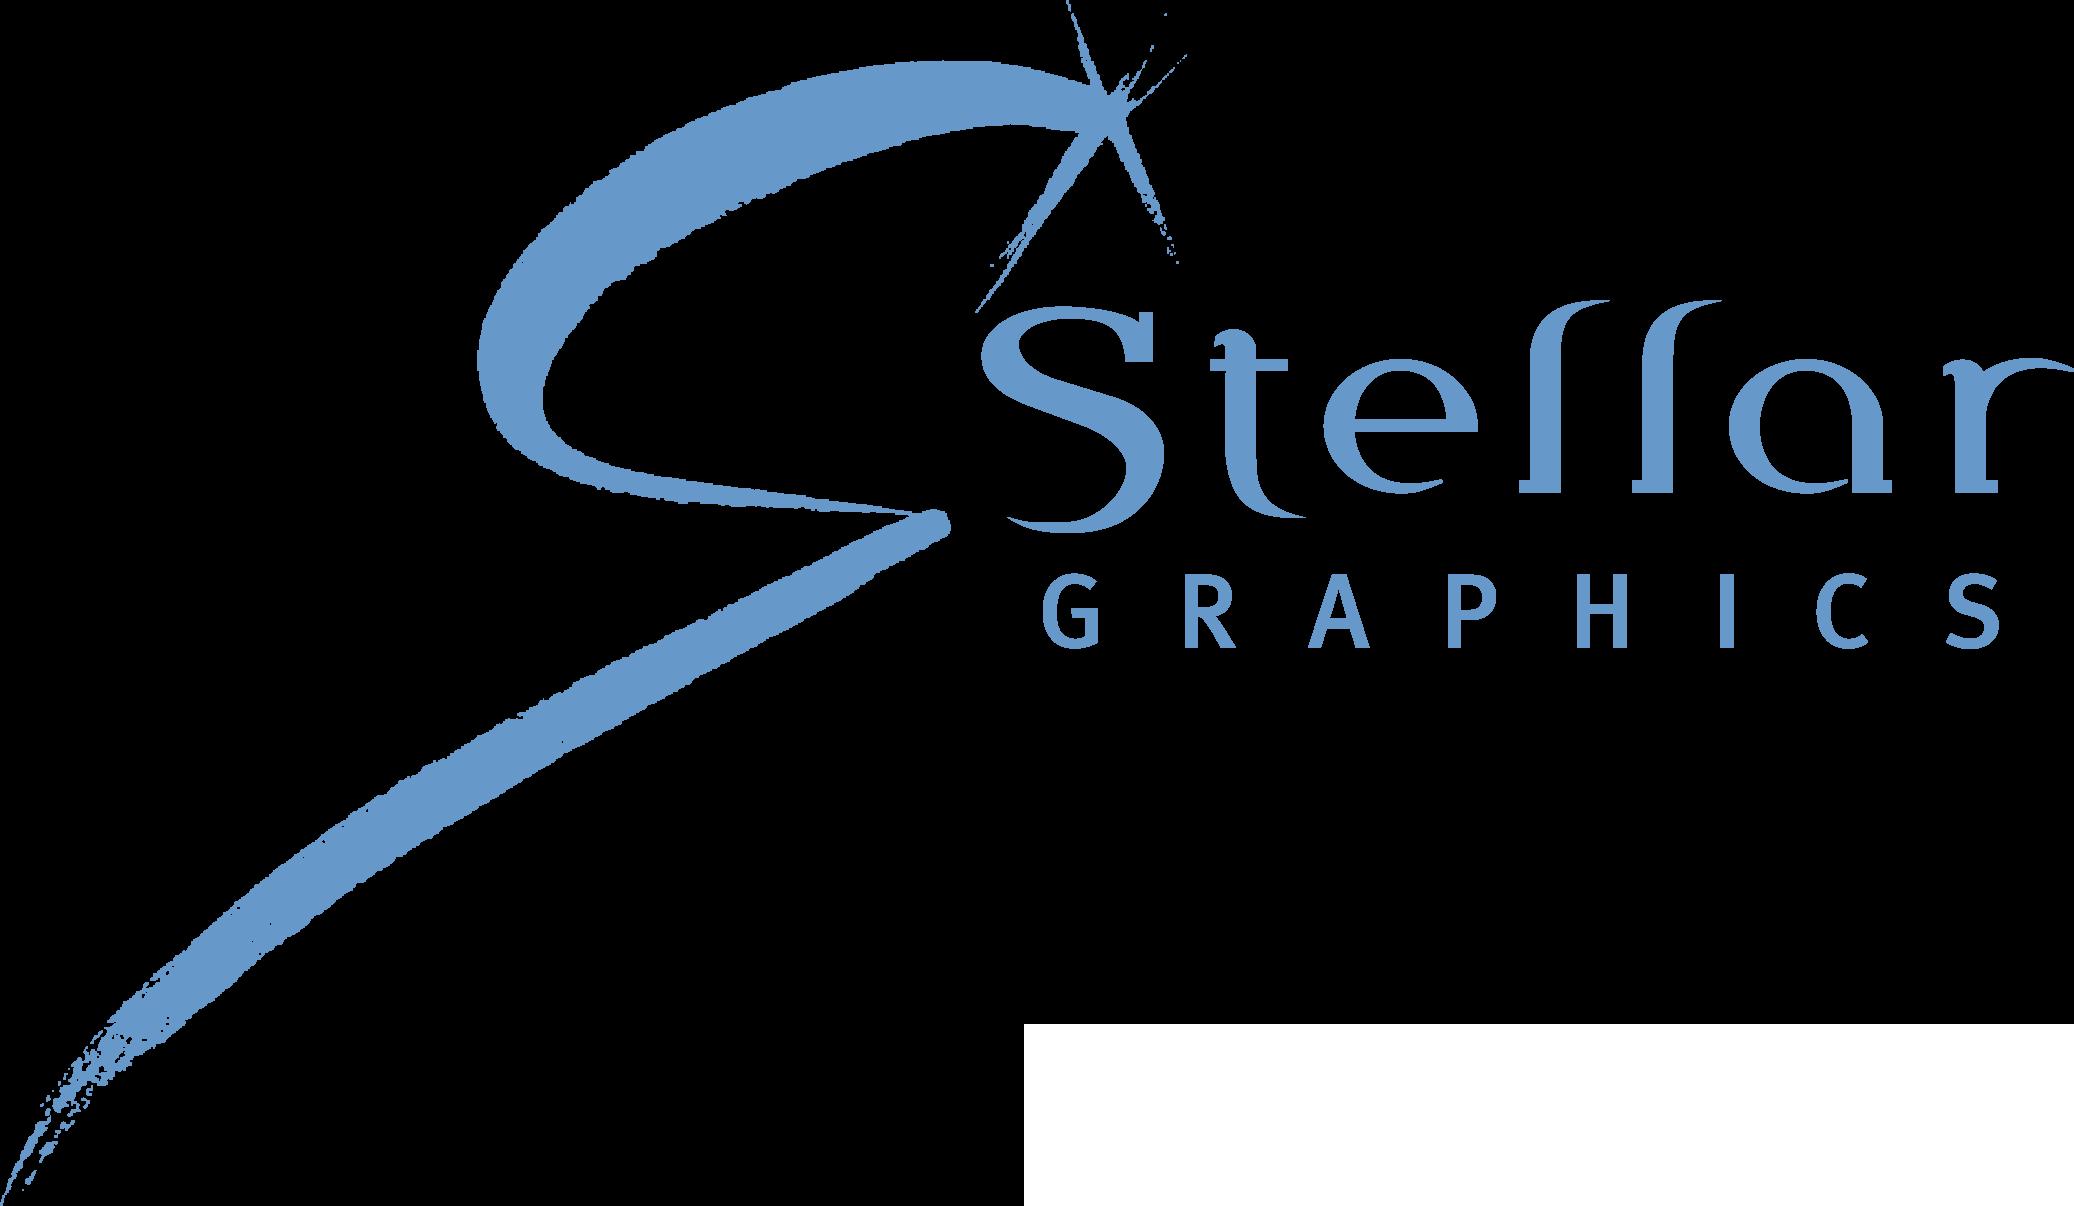 Stellar Graphics